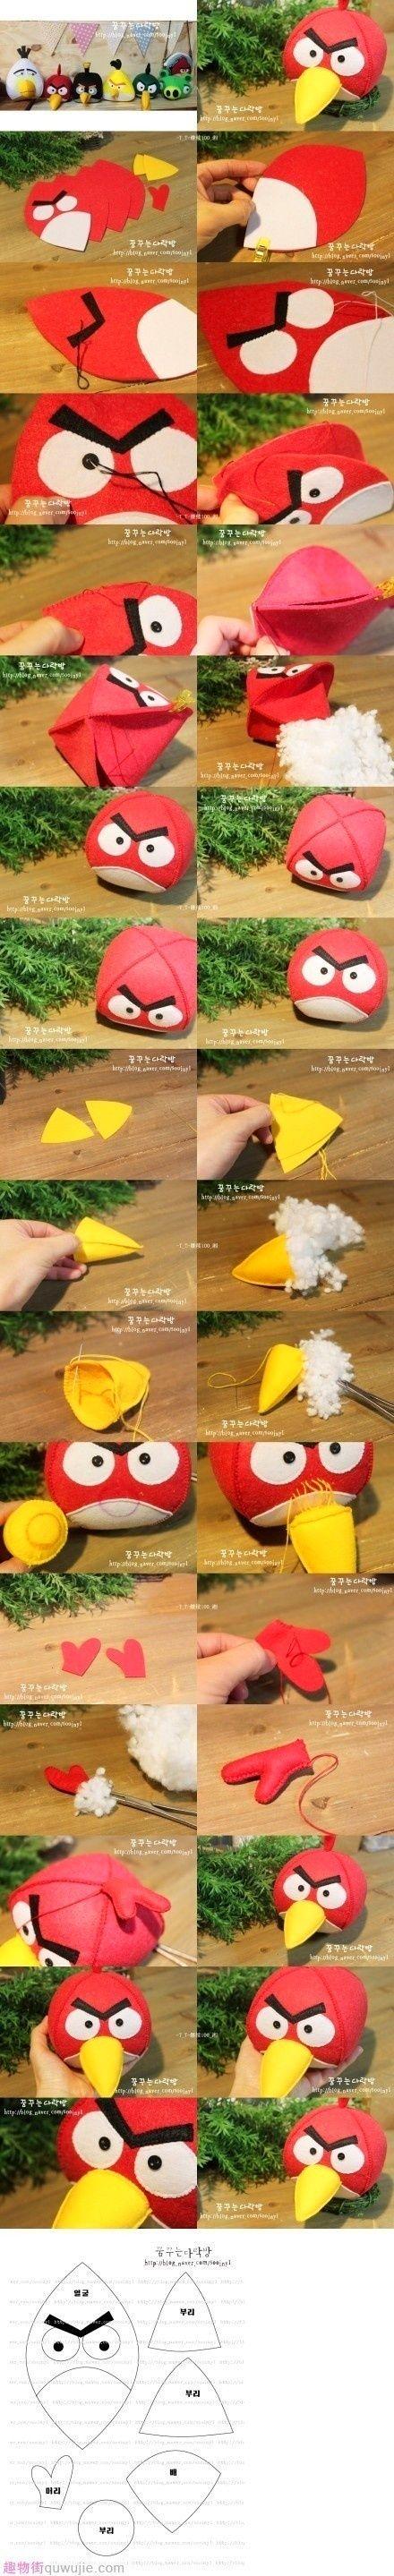 DIY Angry Bird Plush Toys | iCreativeIdeas.com Like Us on Facebook ==> https://www.facebook.com/icreativeideas